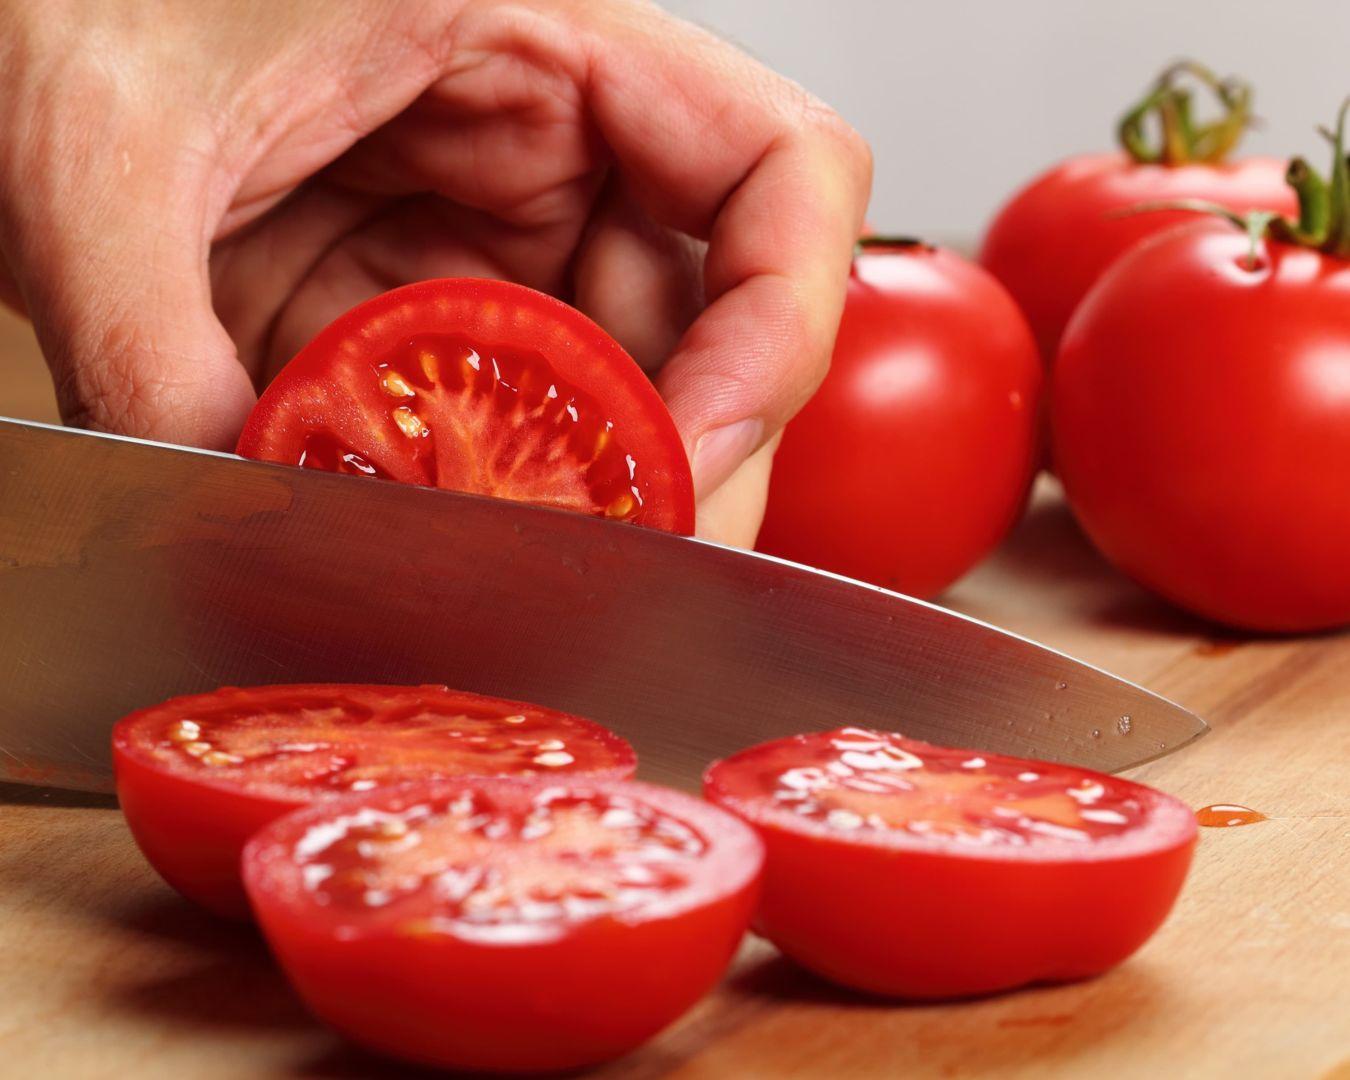 cortando tomates